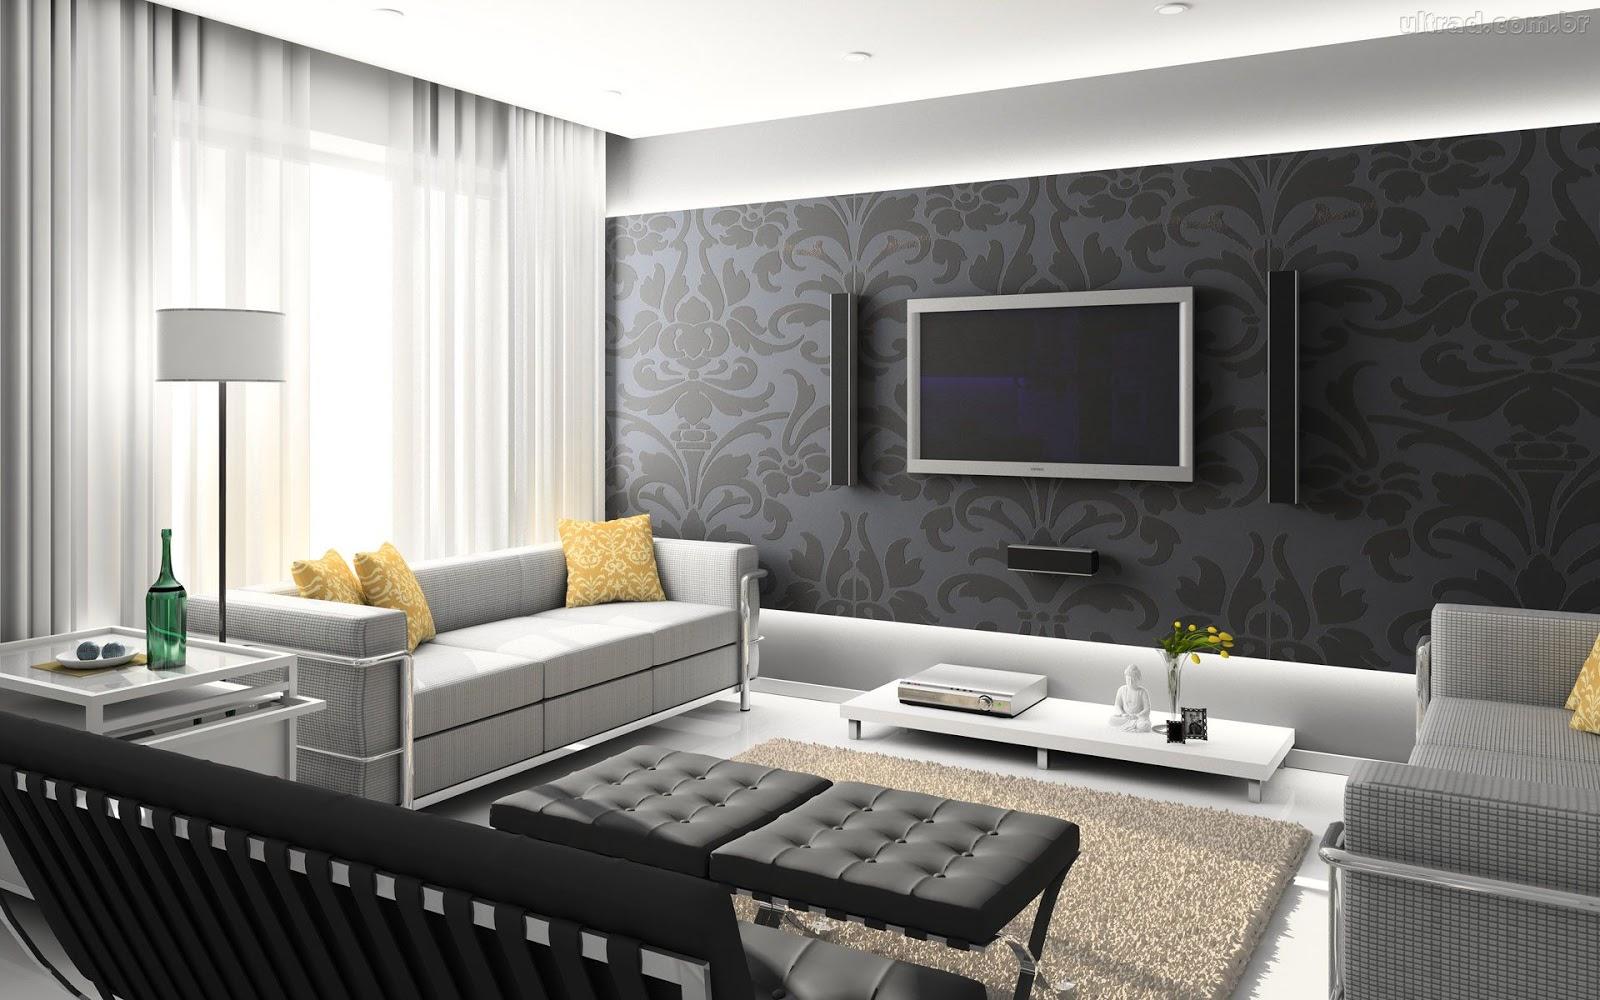 papel de parede decoracao de interiores:Luana Moraes: PAPEL DE PAREDE NA DECORAÇÃO DE INTERIORES